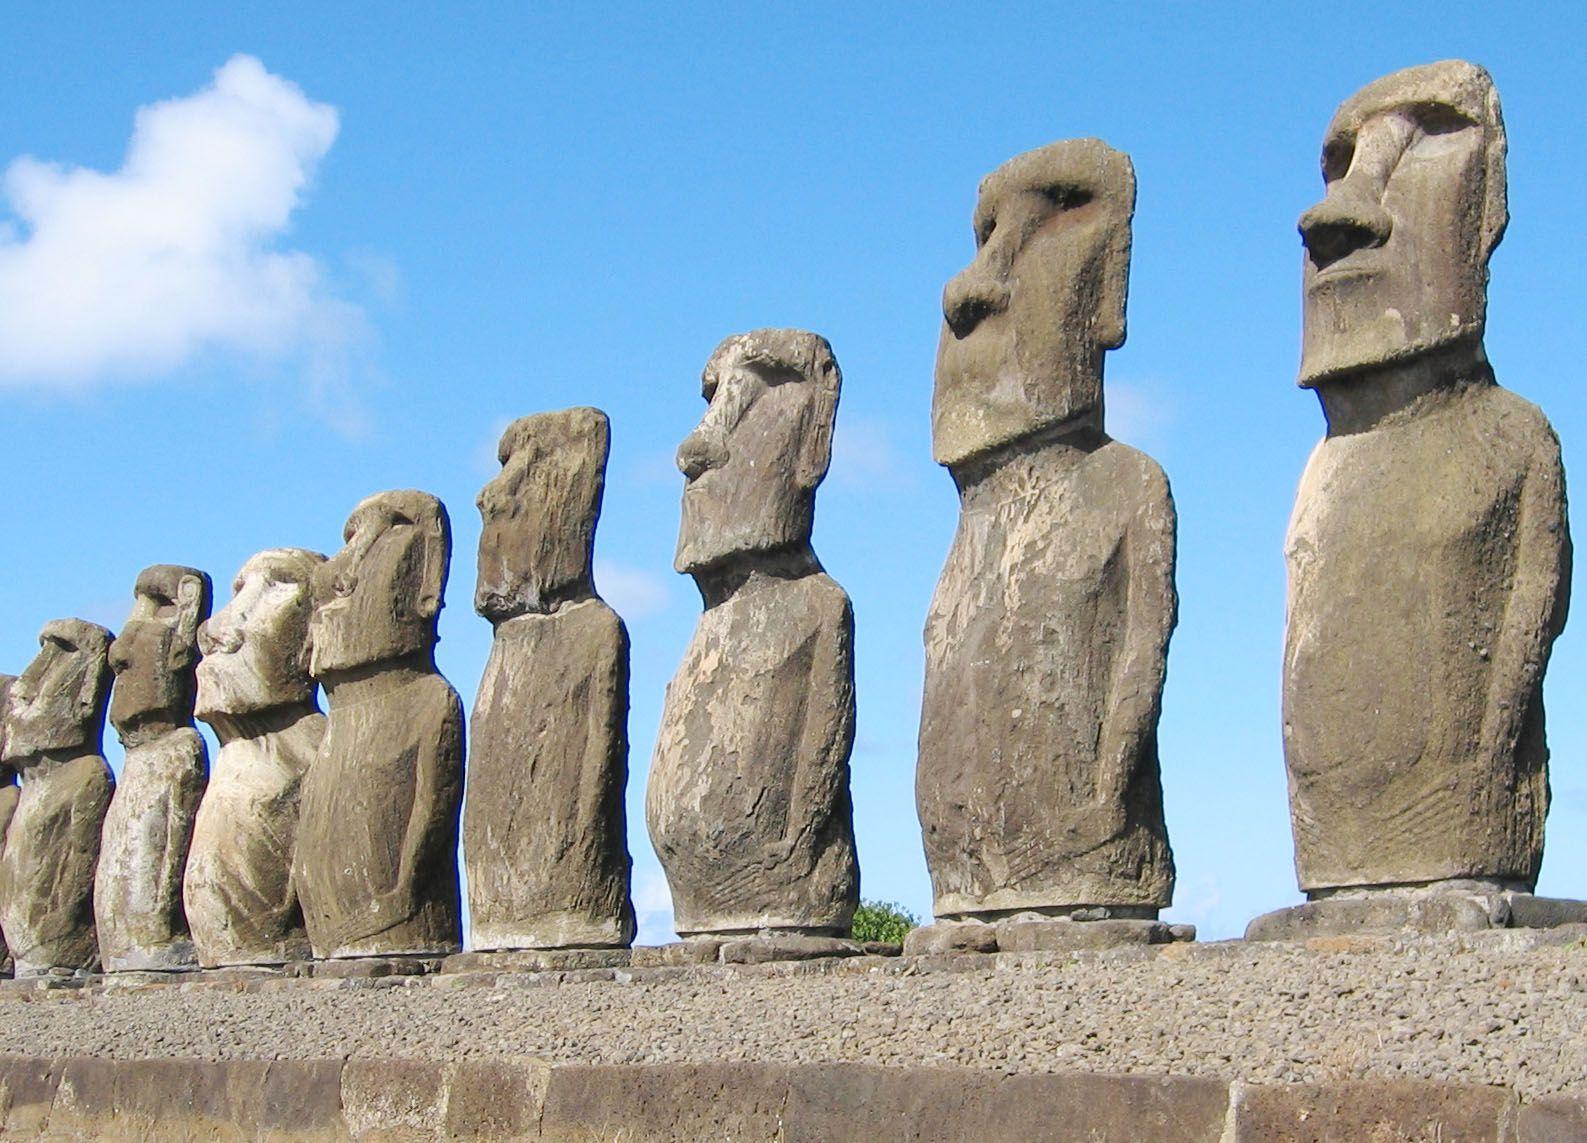 Nature medicine with Moai statue hologram